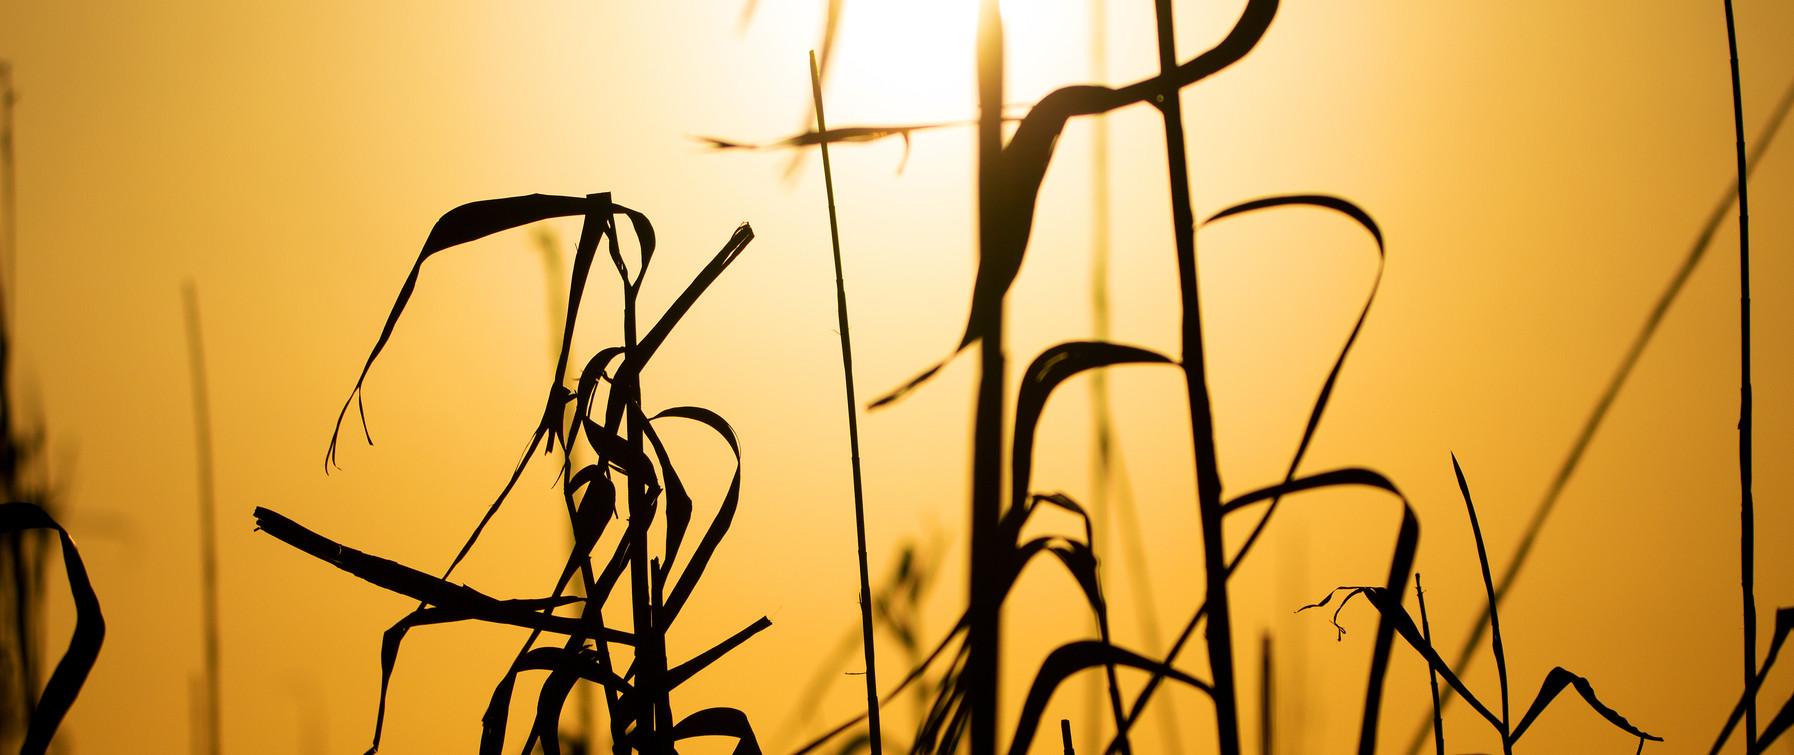 Fall Pampas Grass in sunset